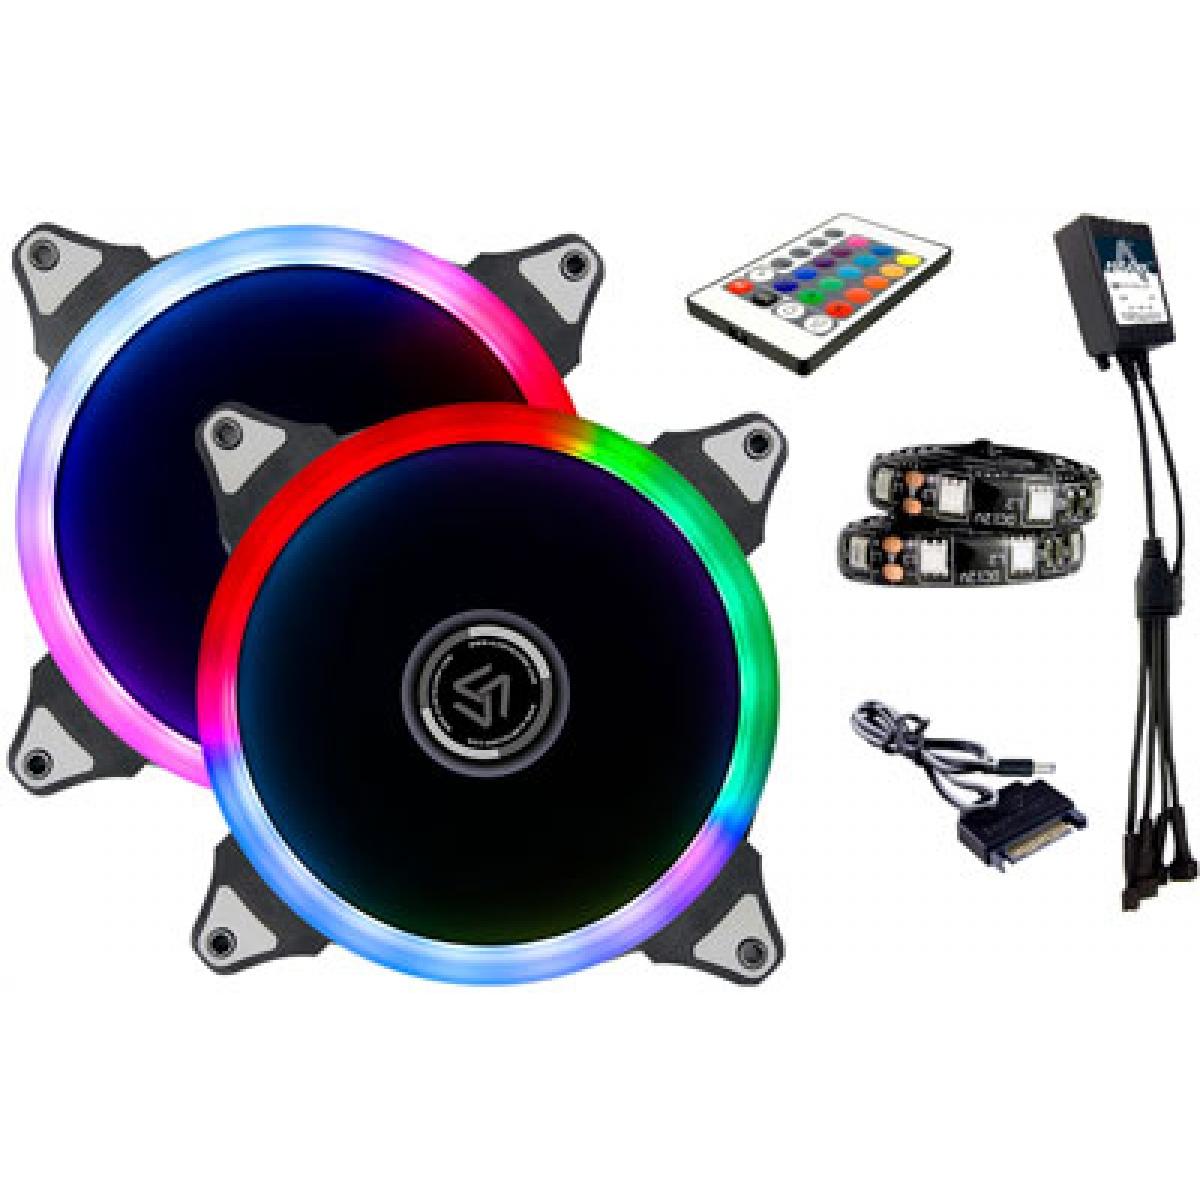 Kit Fan com 2 Unidades Alseye Aurora Rainbow RGB, 120mm, Fita LED, com Controlador, CRLS-200A